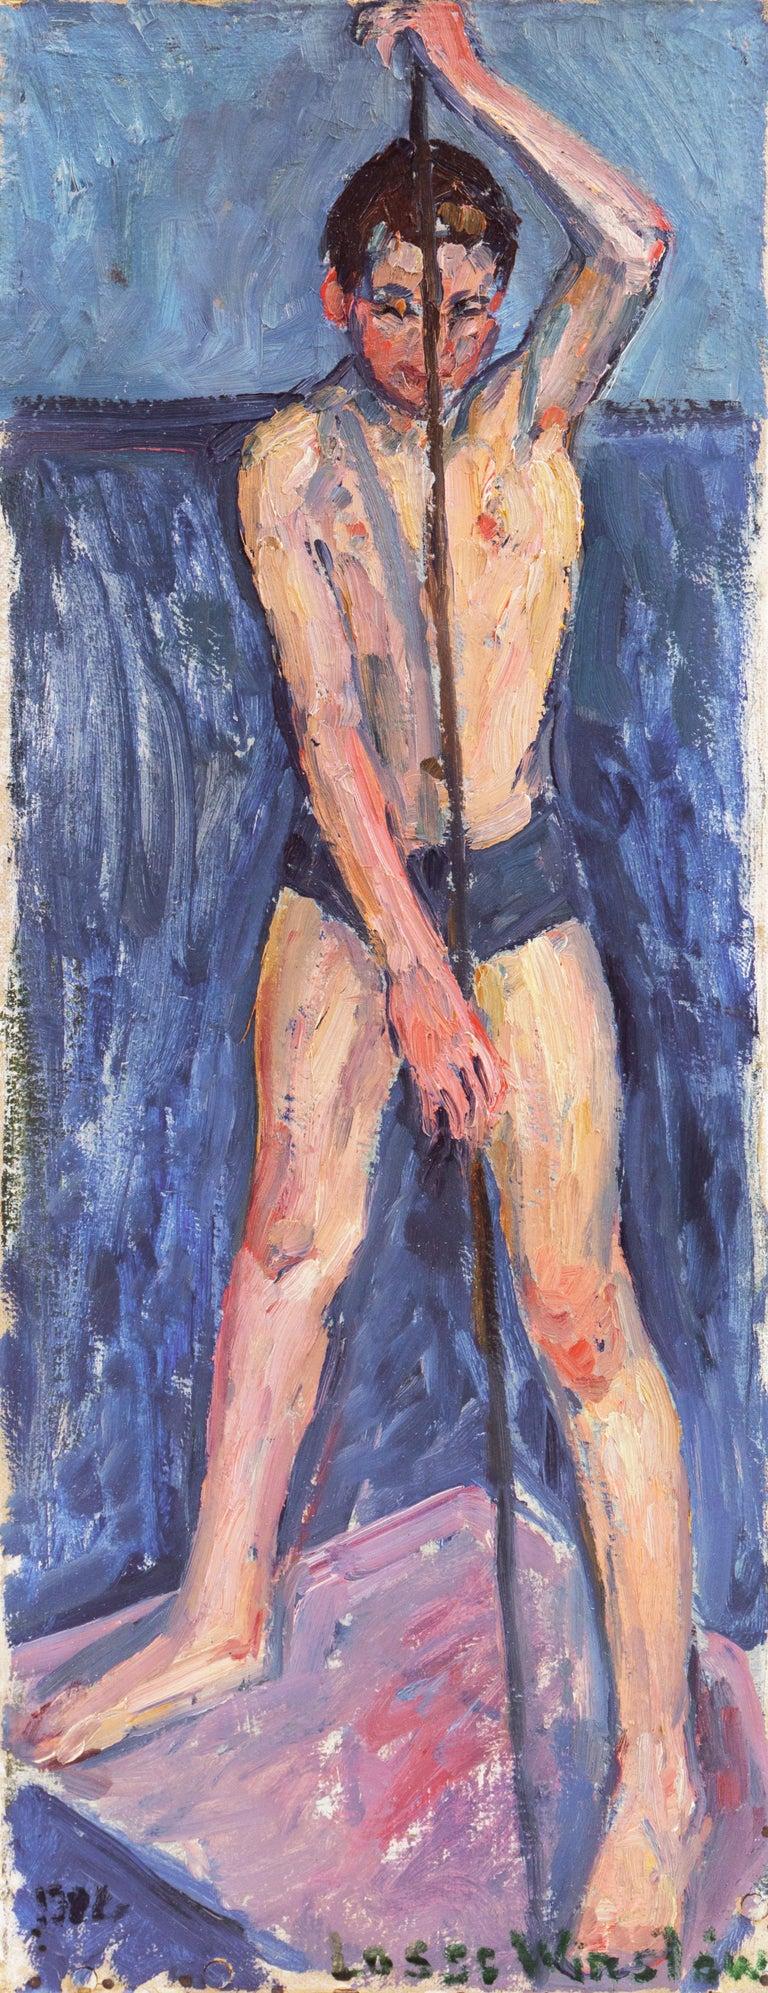 Lasse Winslow Figurative Painting - Danish Post-Impressionist Figural, 'The Fisherboy', Copenhagen